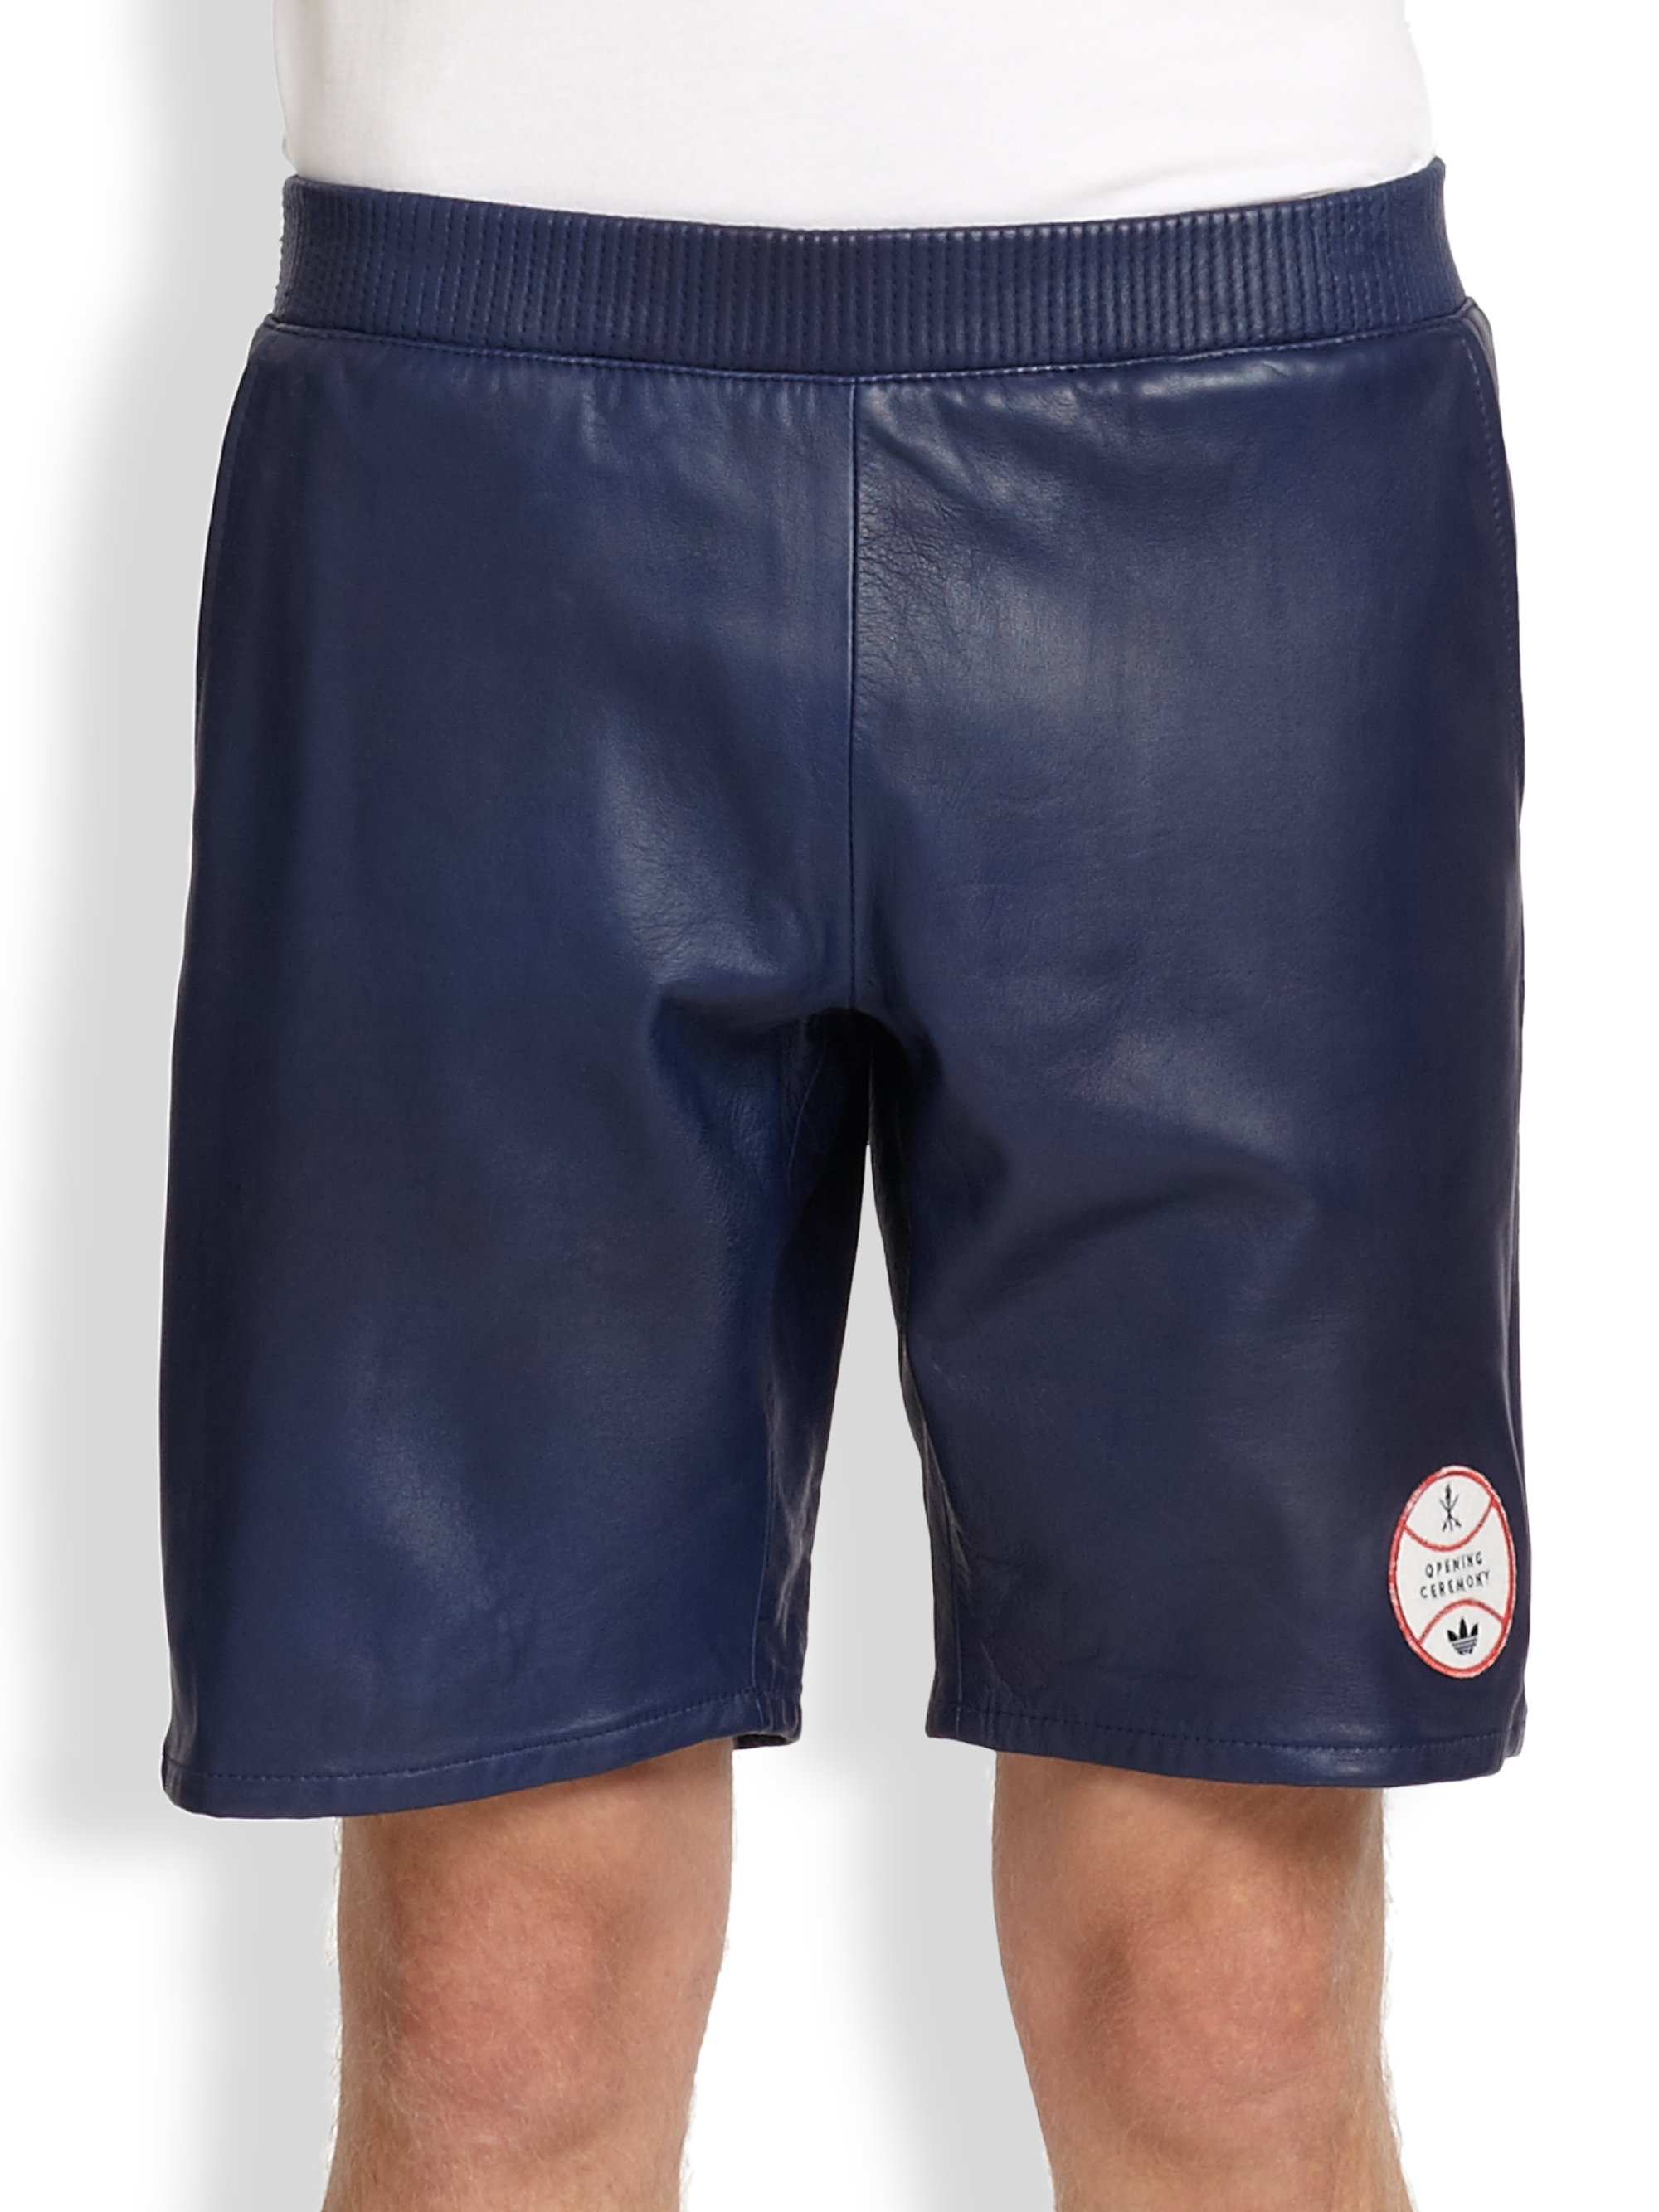 Athletic Fit Jeans For Men